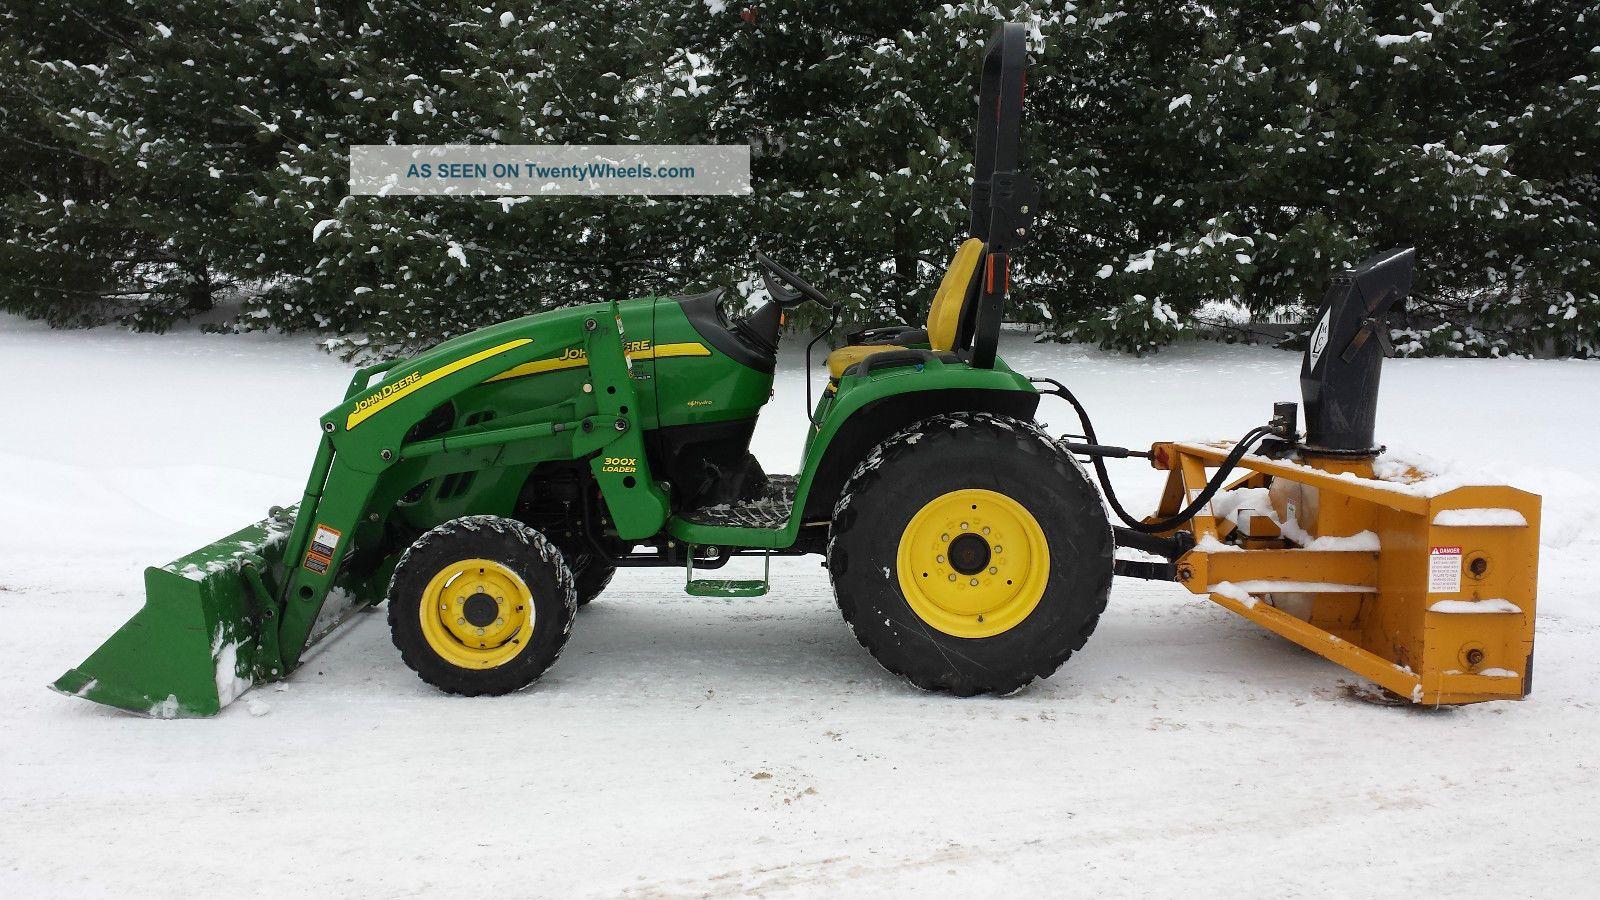 2008 John Deere 3320 Hydrostatic Tractor 550 Hours